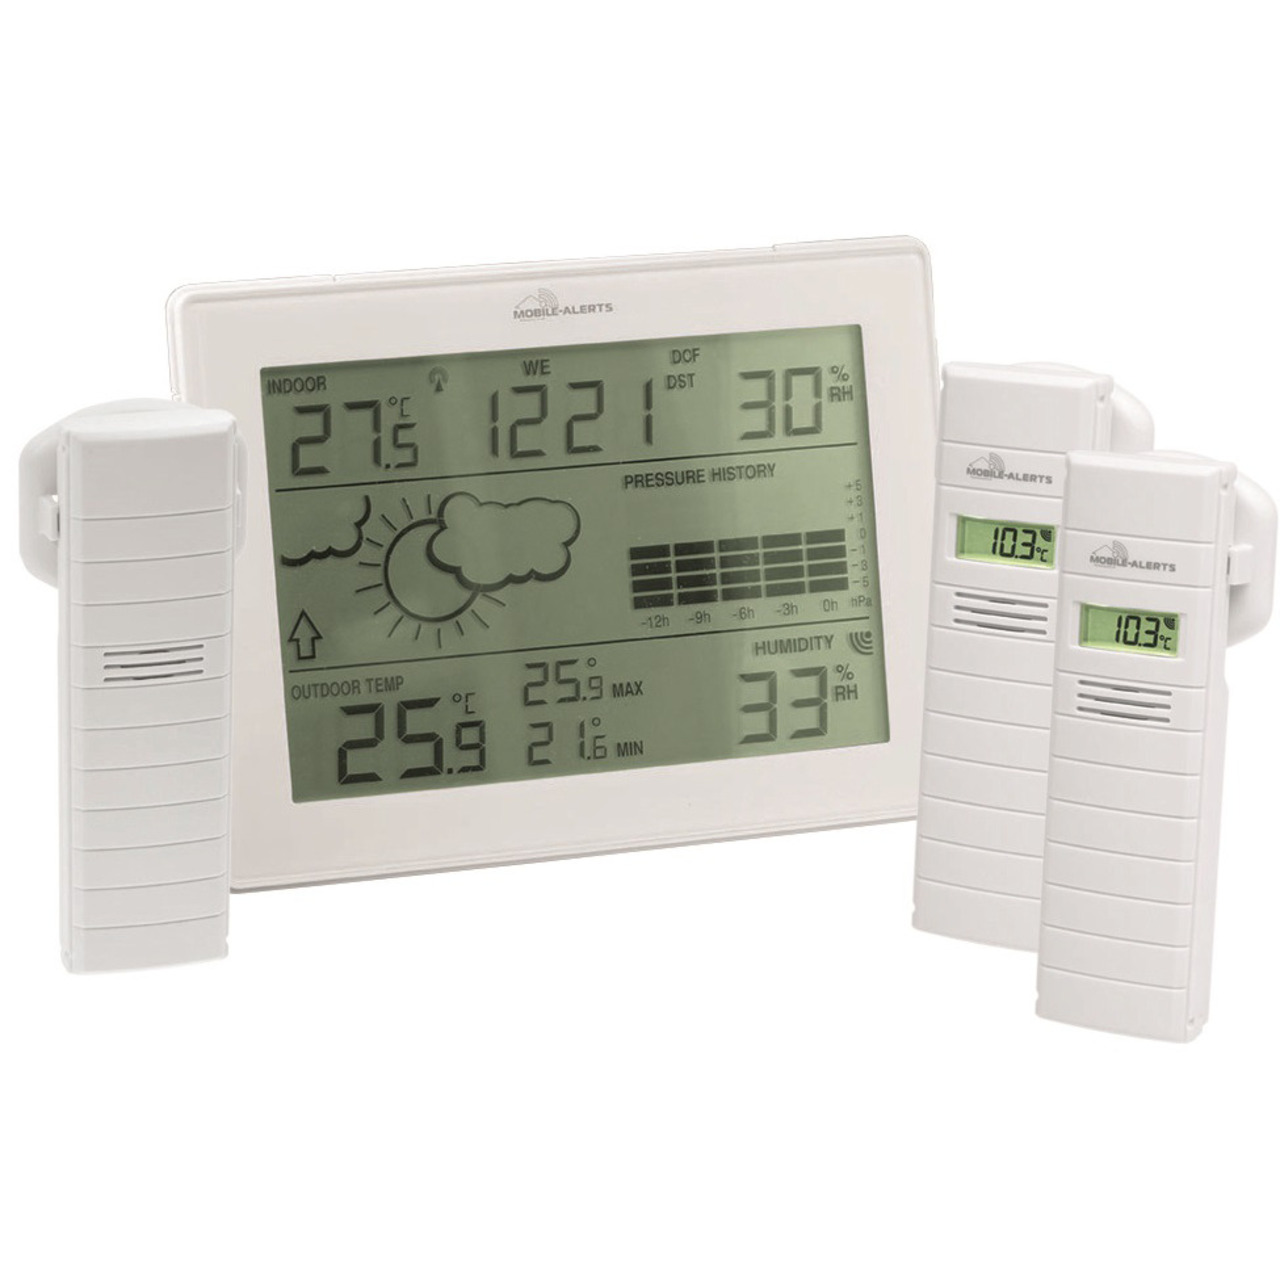 ELV Mobile Alerts Zusatzsensoren-Spar-Set: Wetterstation MA10410- inkl- 3x Thermo-Hygrosensor